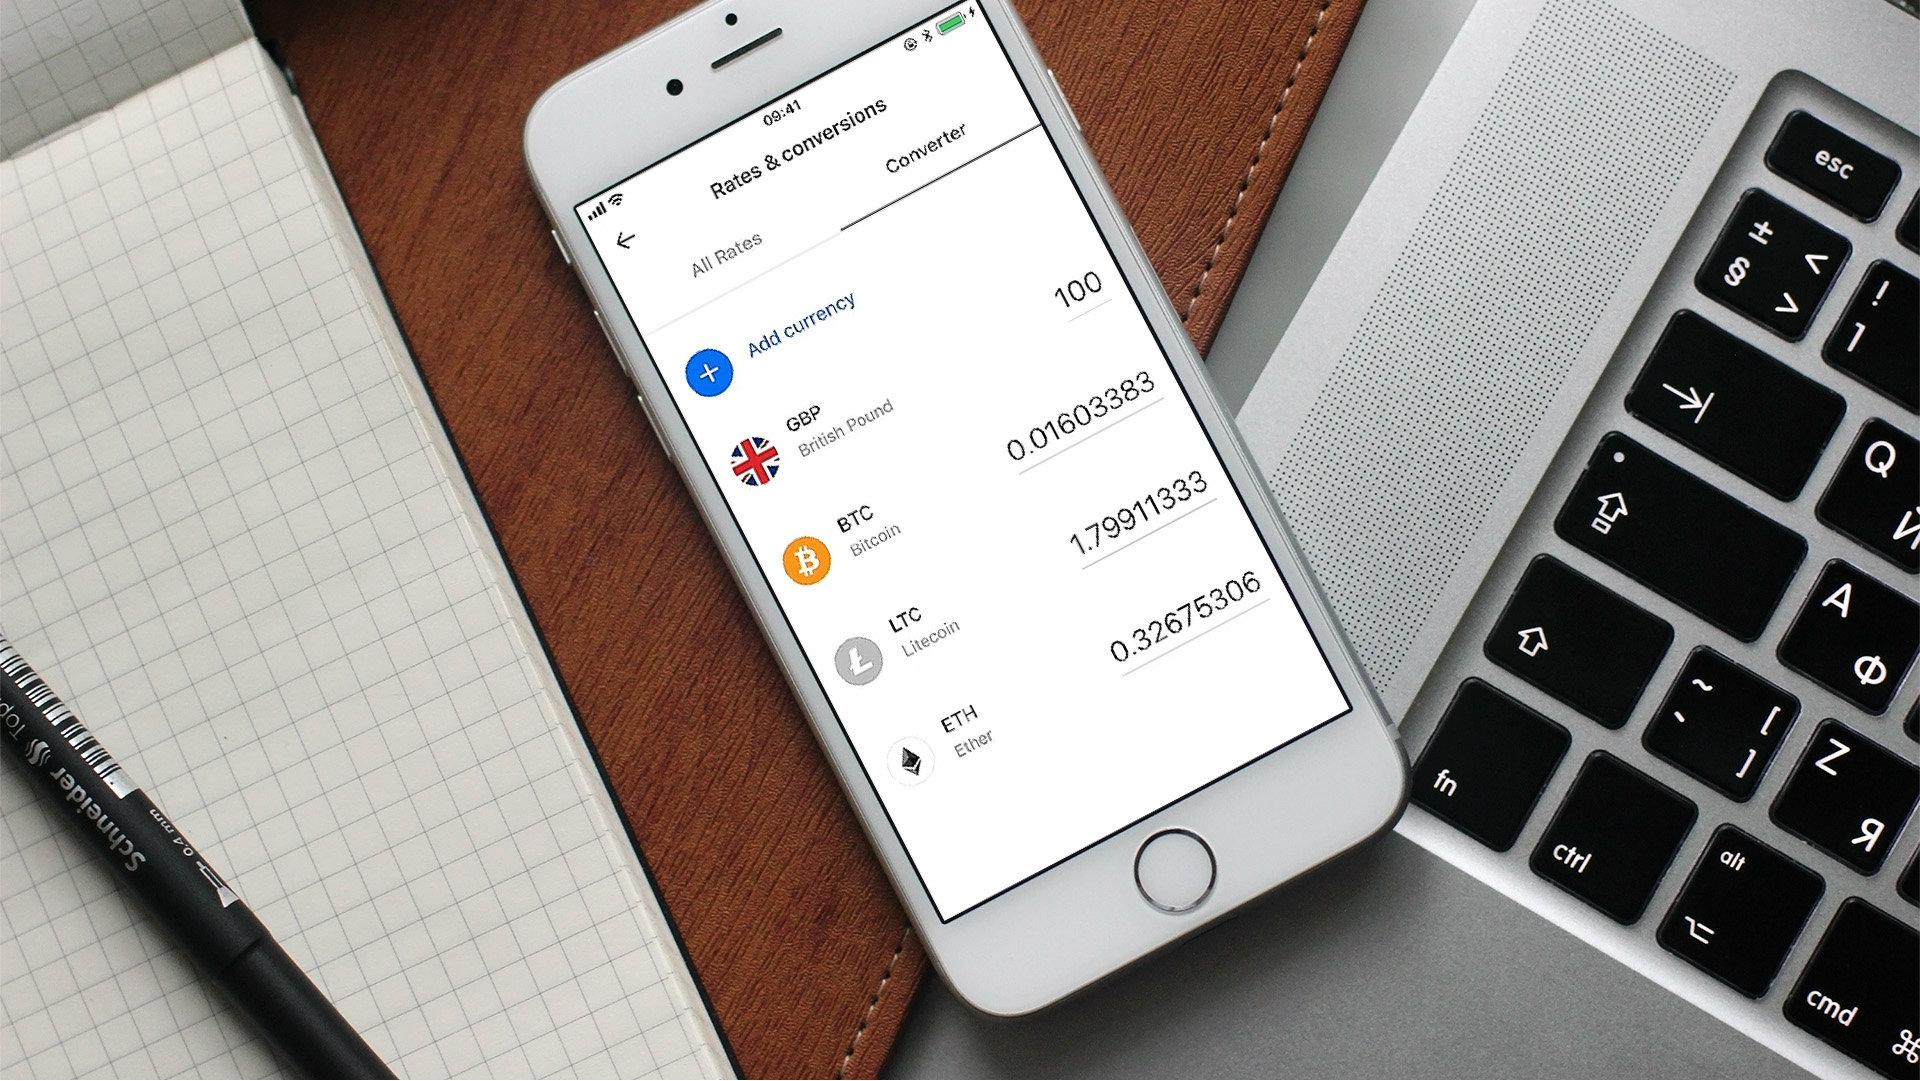 Revolut is adding ripple and bitcoin cash